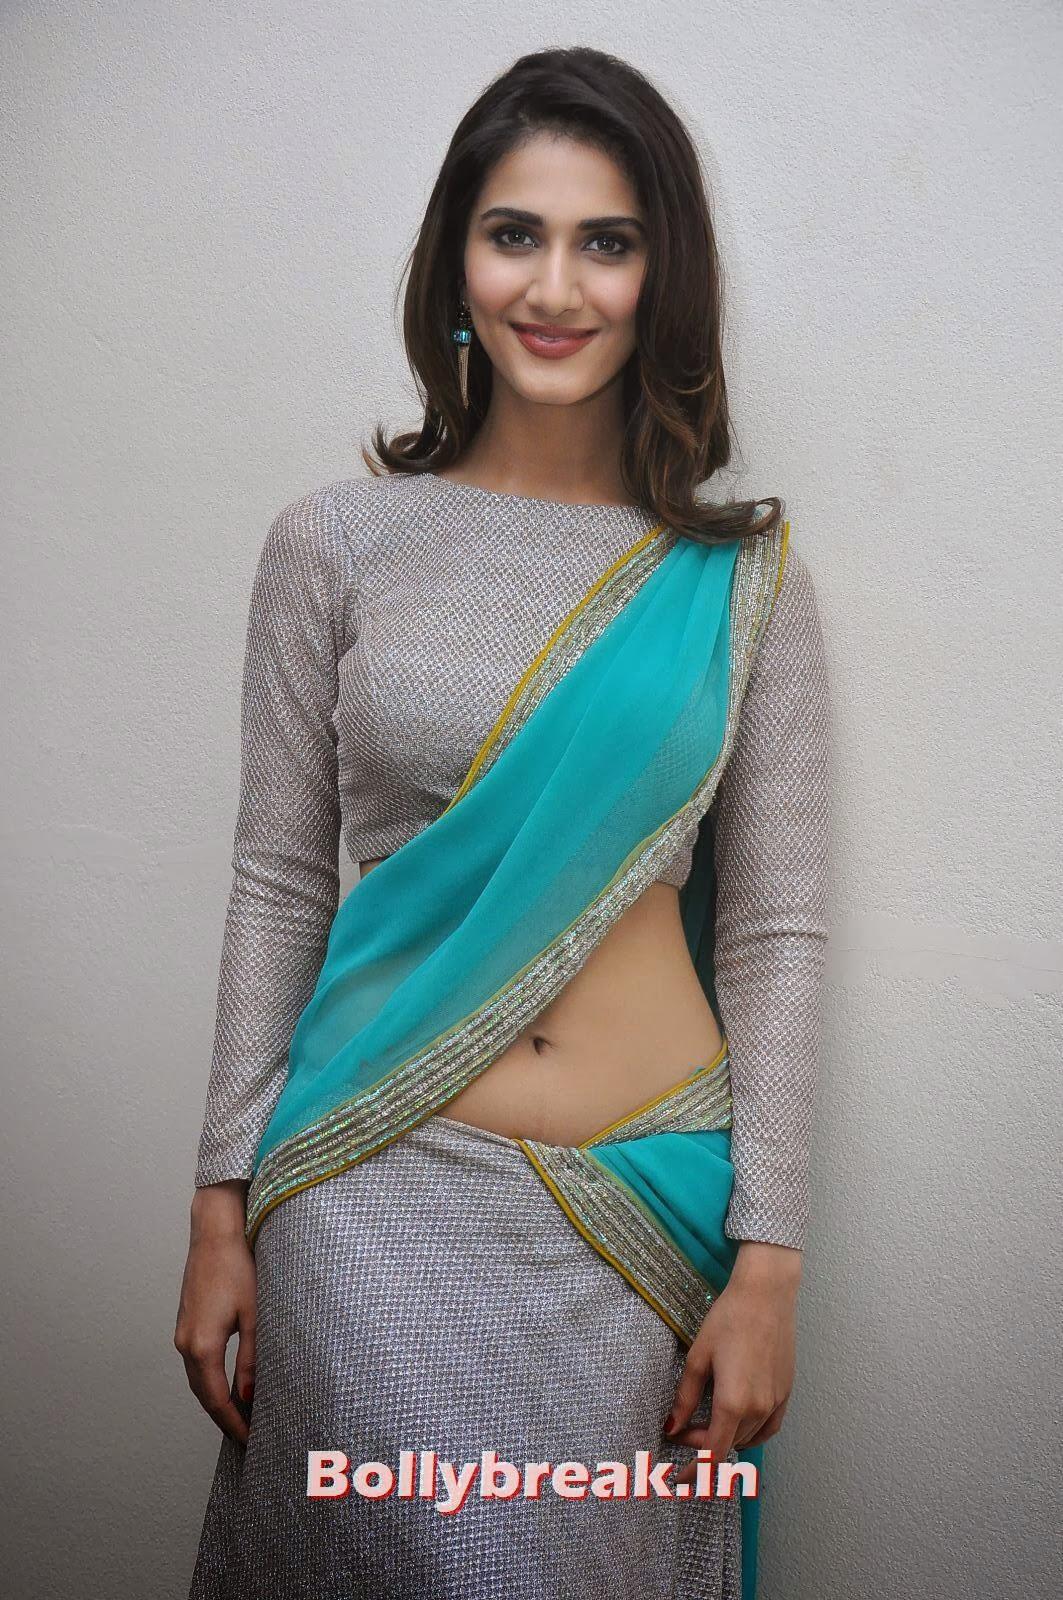 Vaani Kapoor Saree Navel Photo, Vaani Kapoor Images in Saree - Navel Photo Gallery